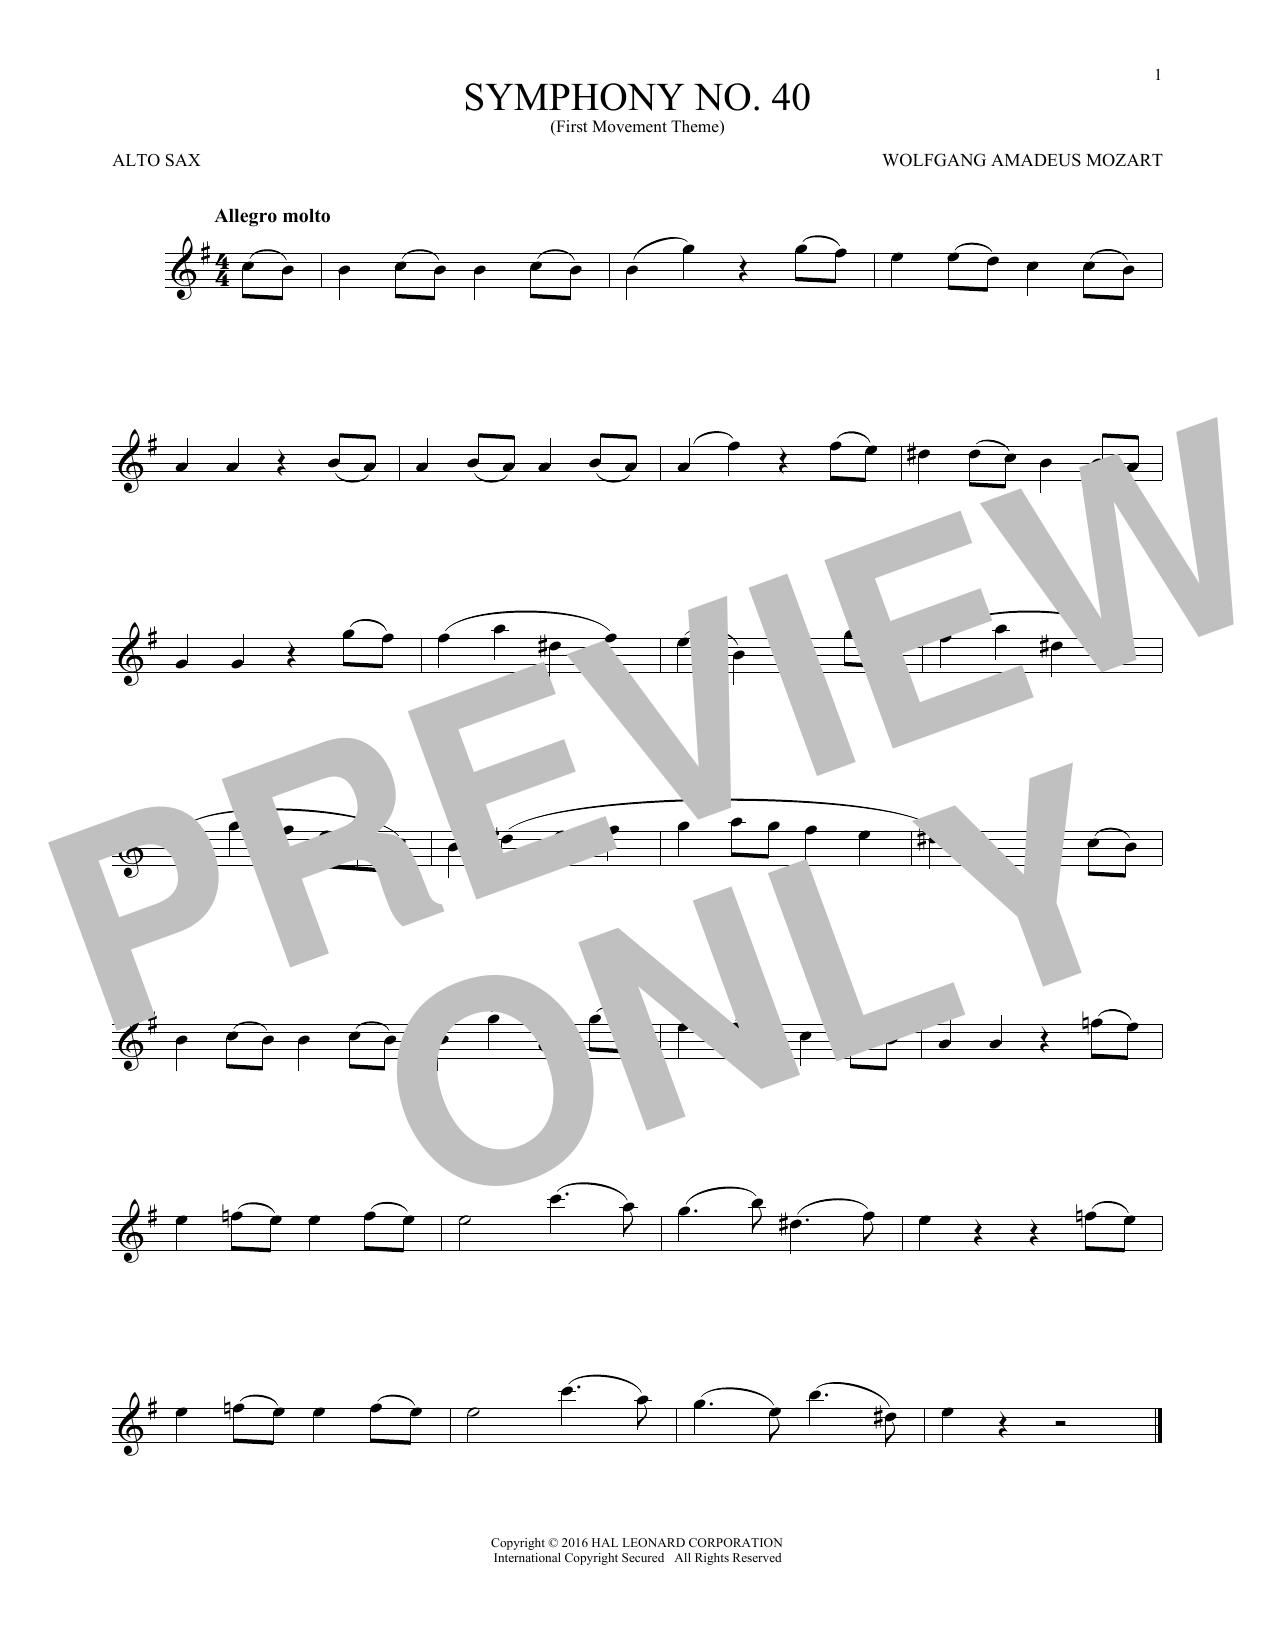 Symphony No. 40 In G Minor, First Movement Excerpt (Alto Sax Solo)